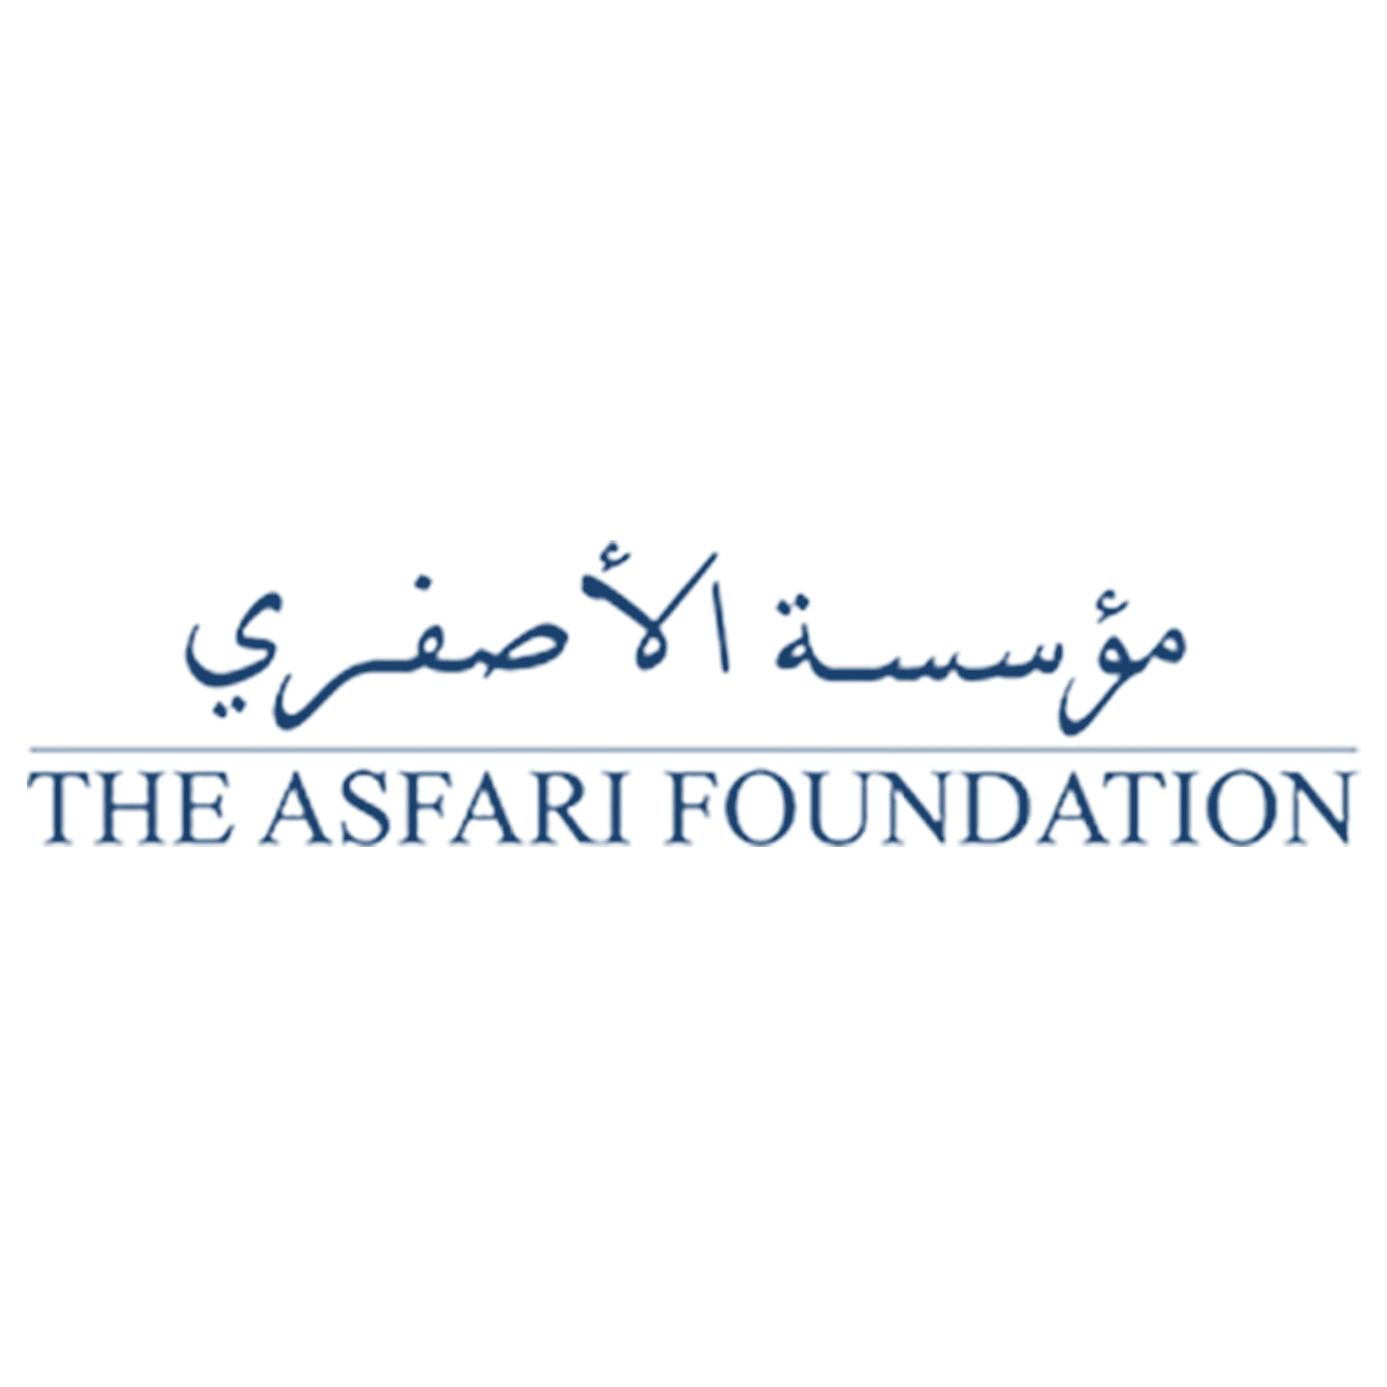 asfari foundation